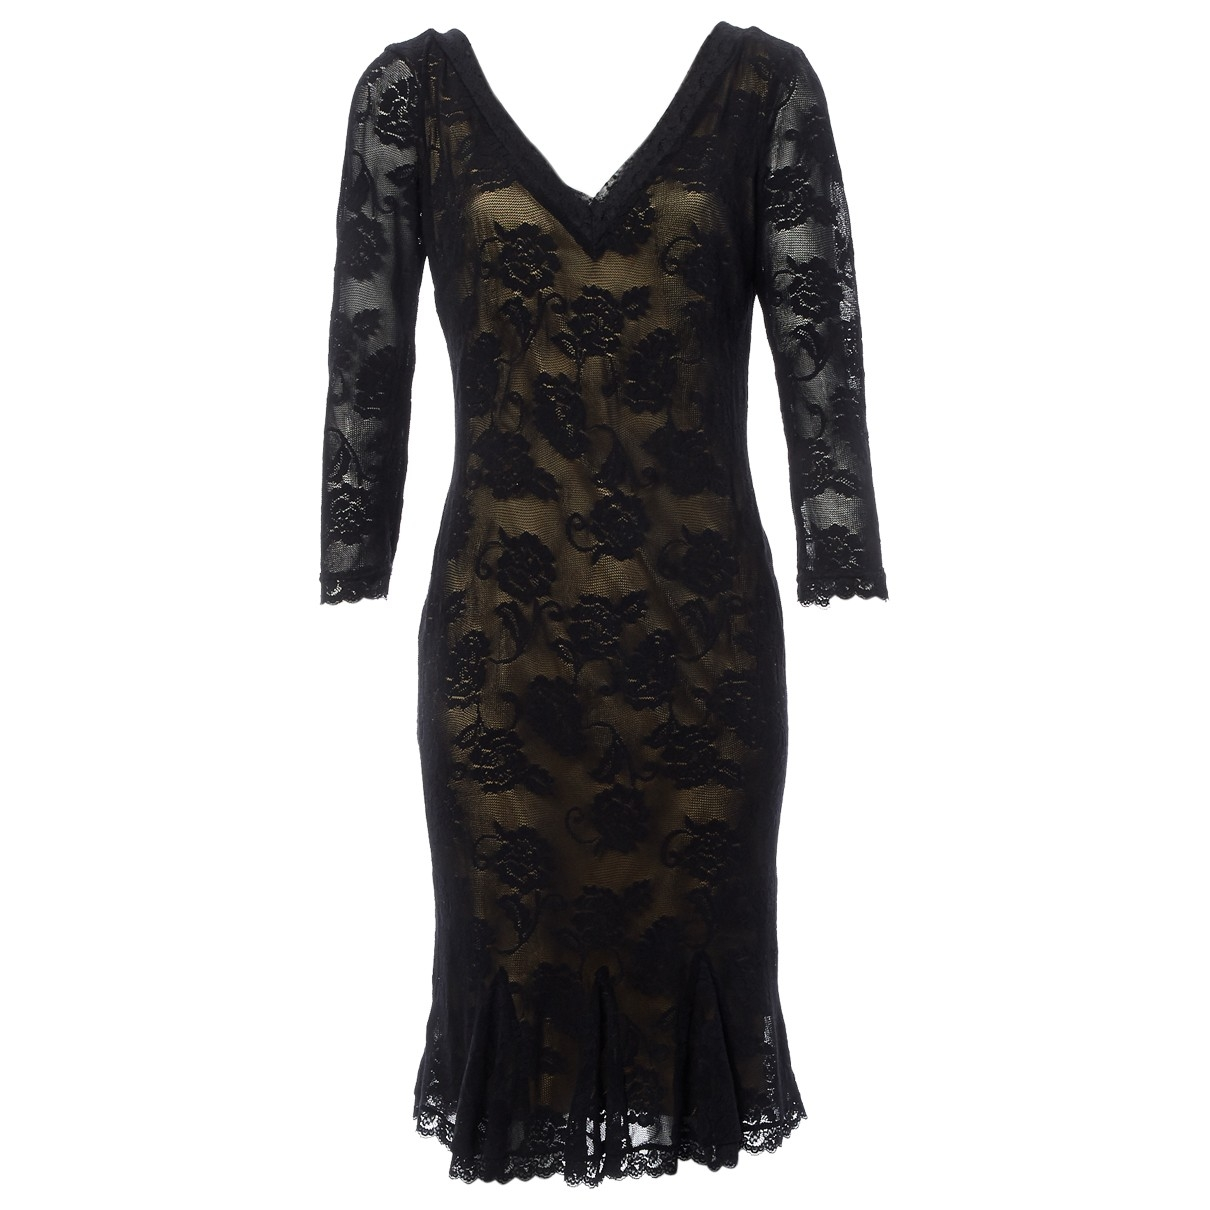 D&g \N Kleid in  Schwarz Synthetik